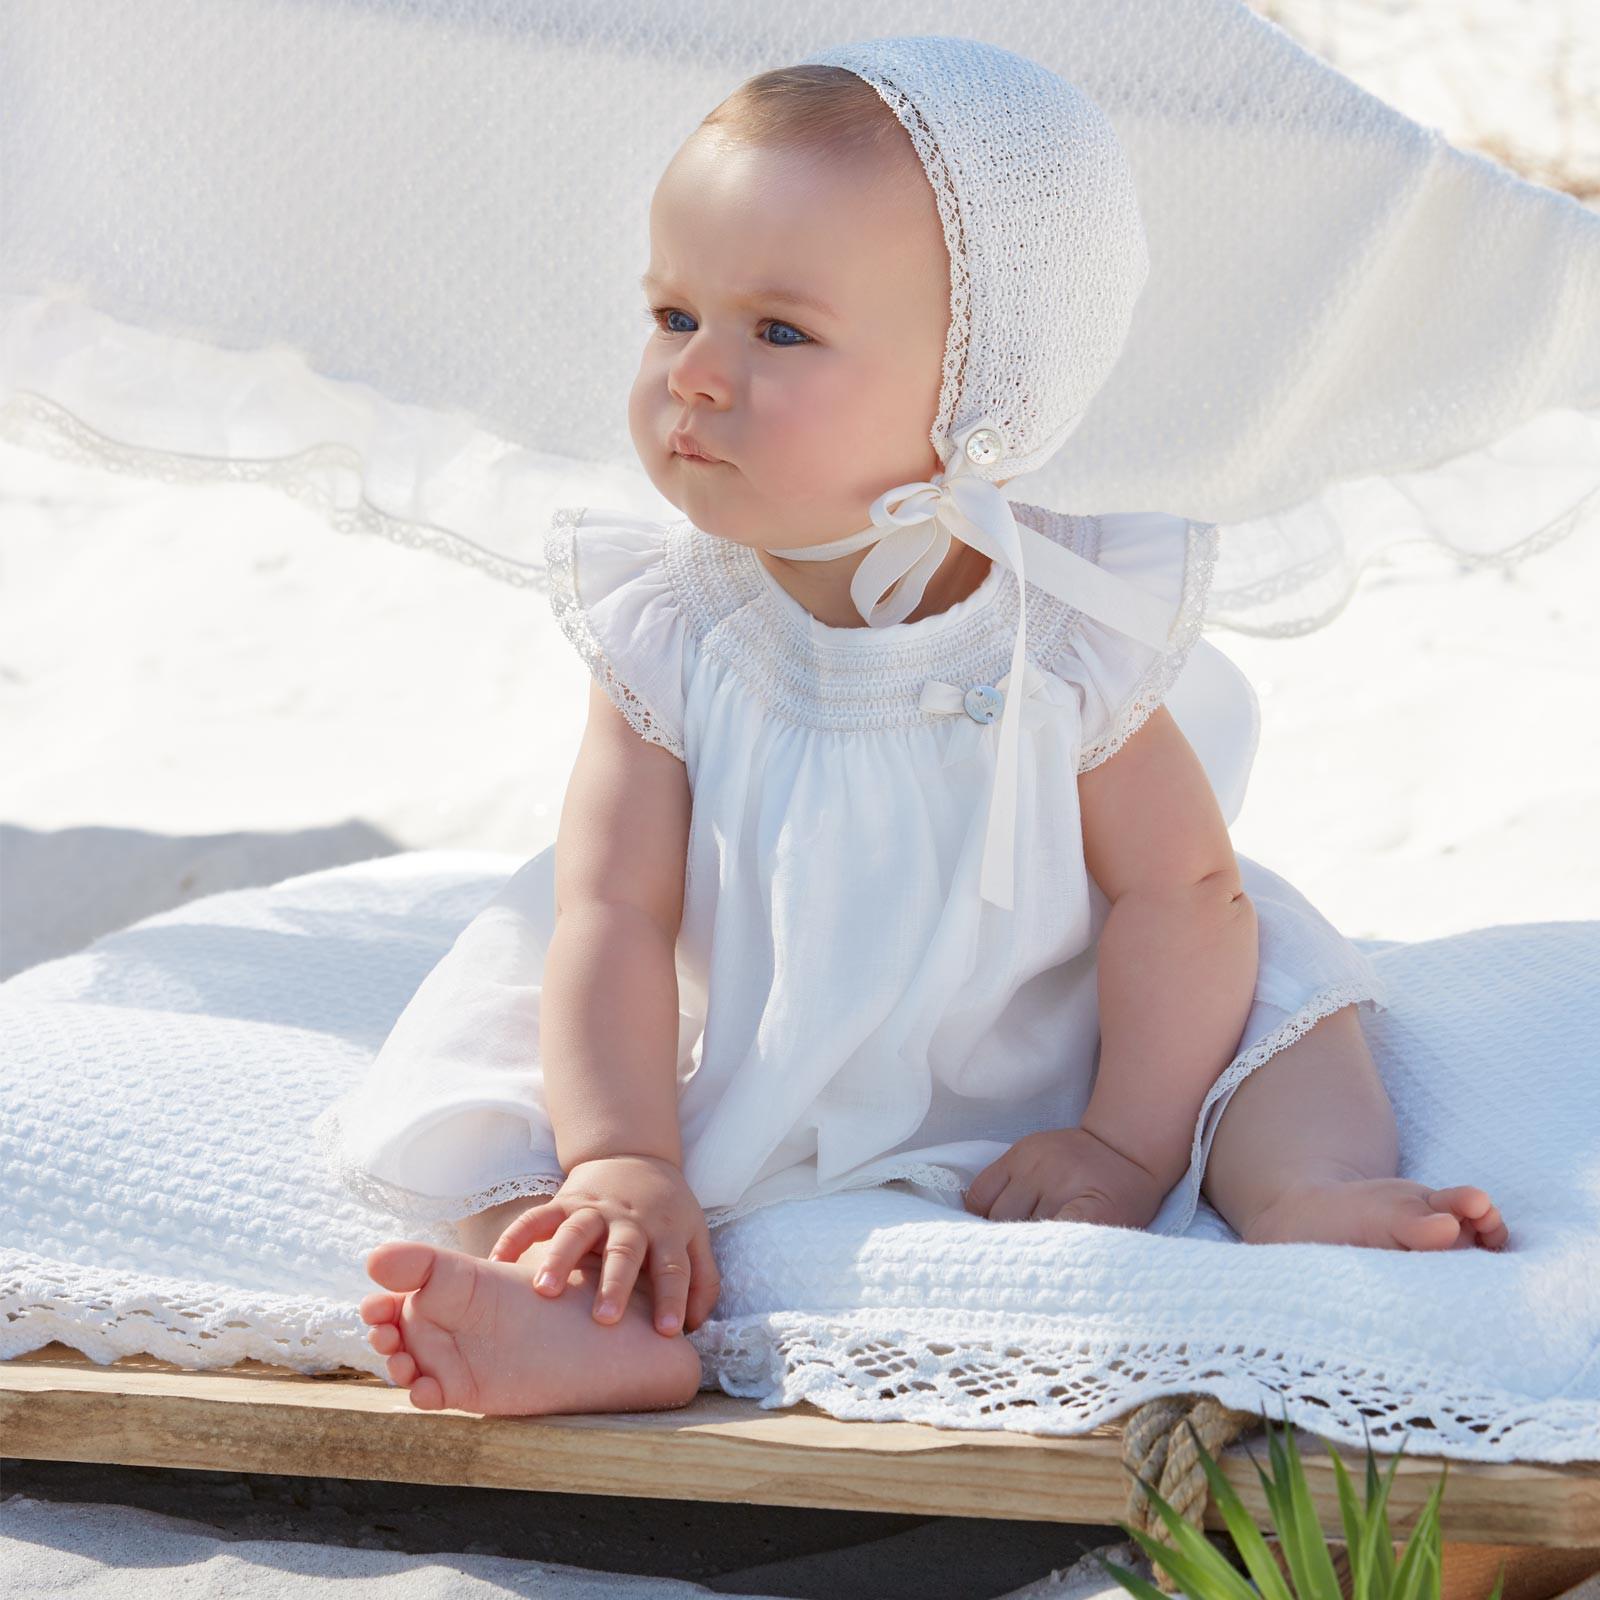 paz rodriguez christening gowns